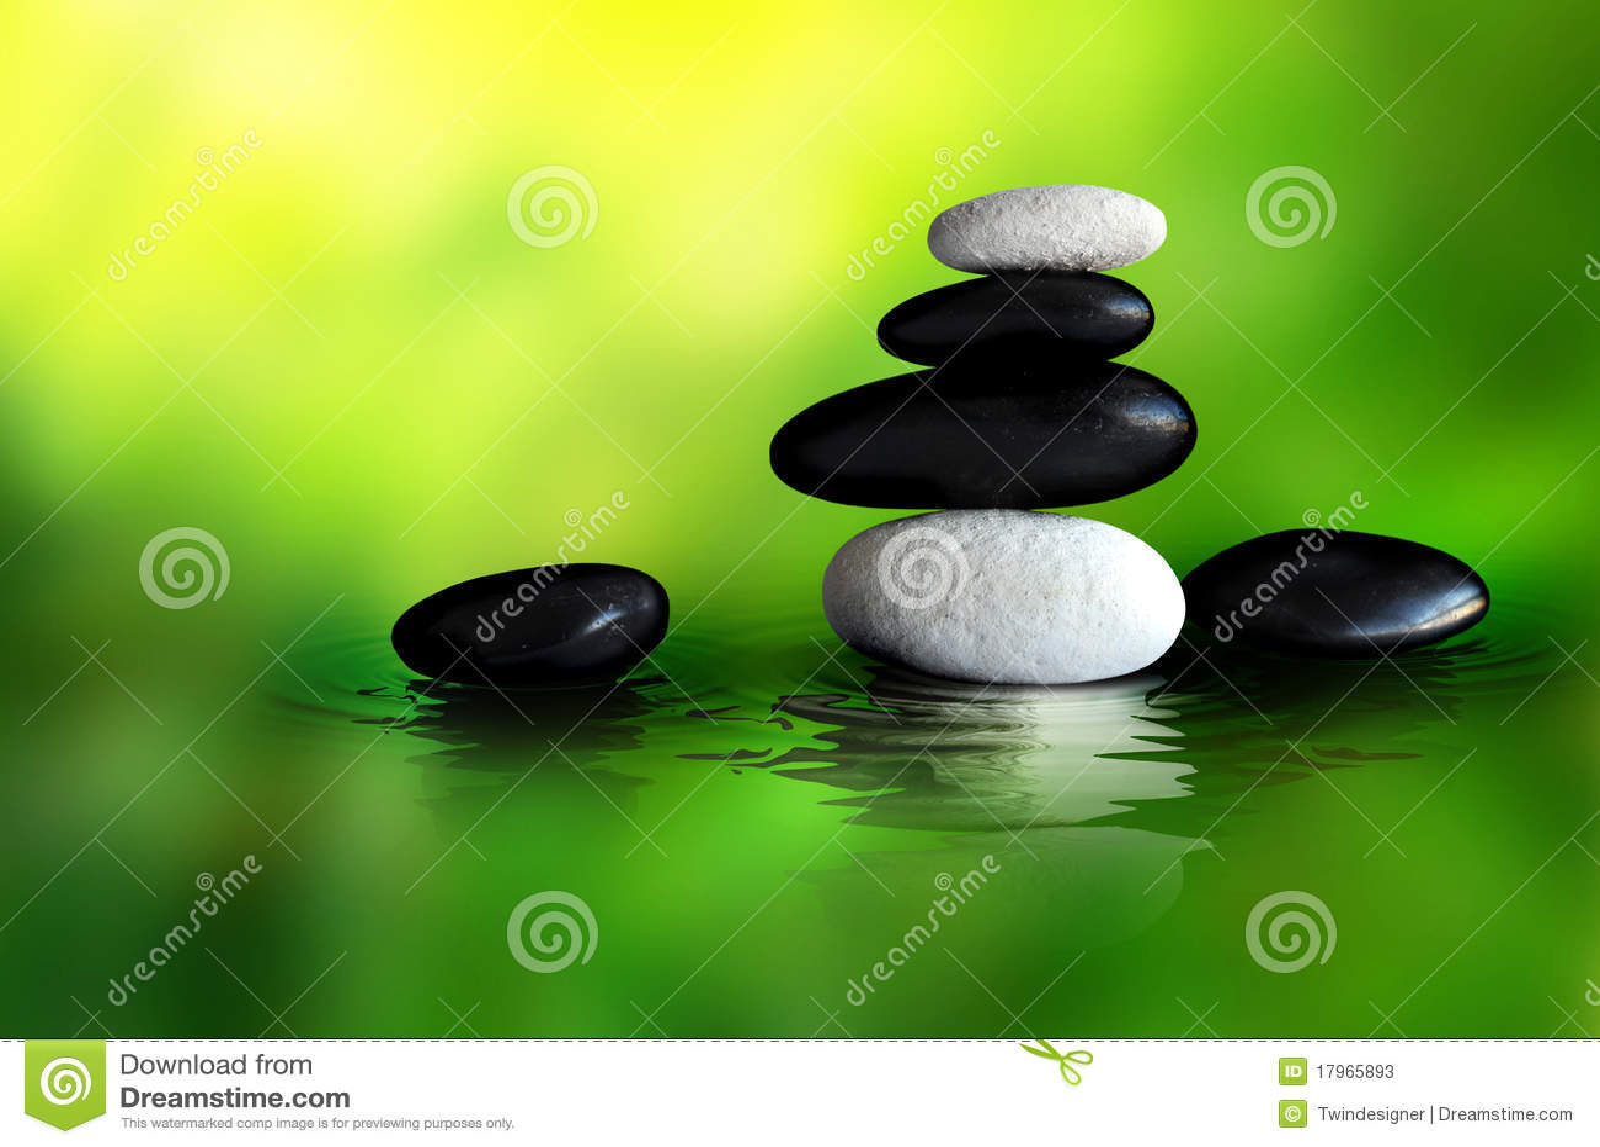 Zen Stones Setting